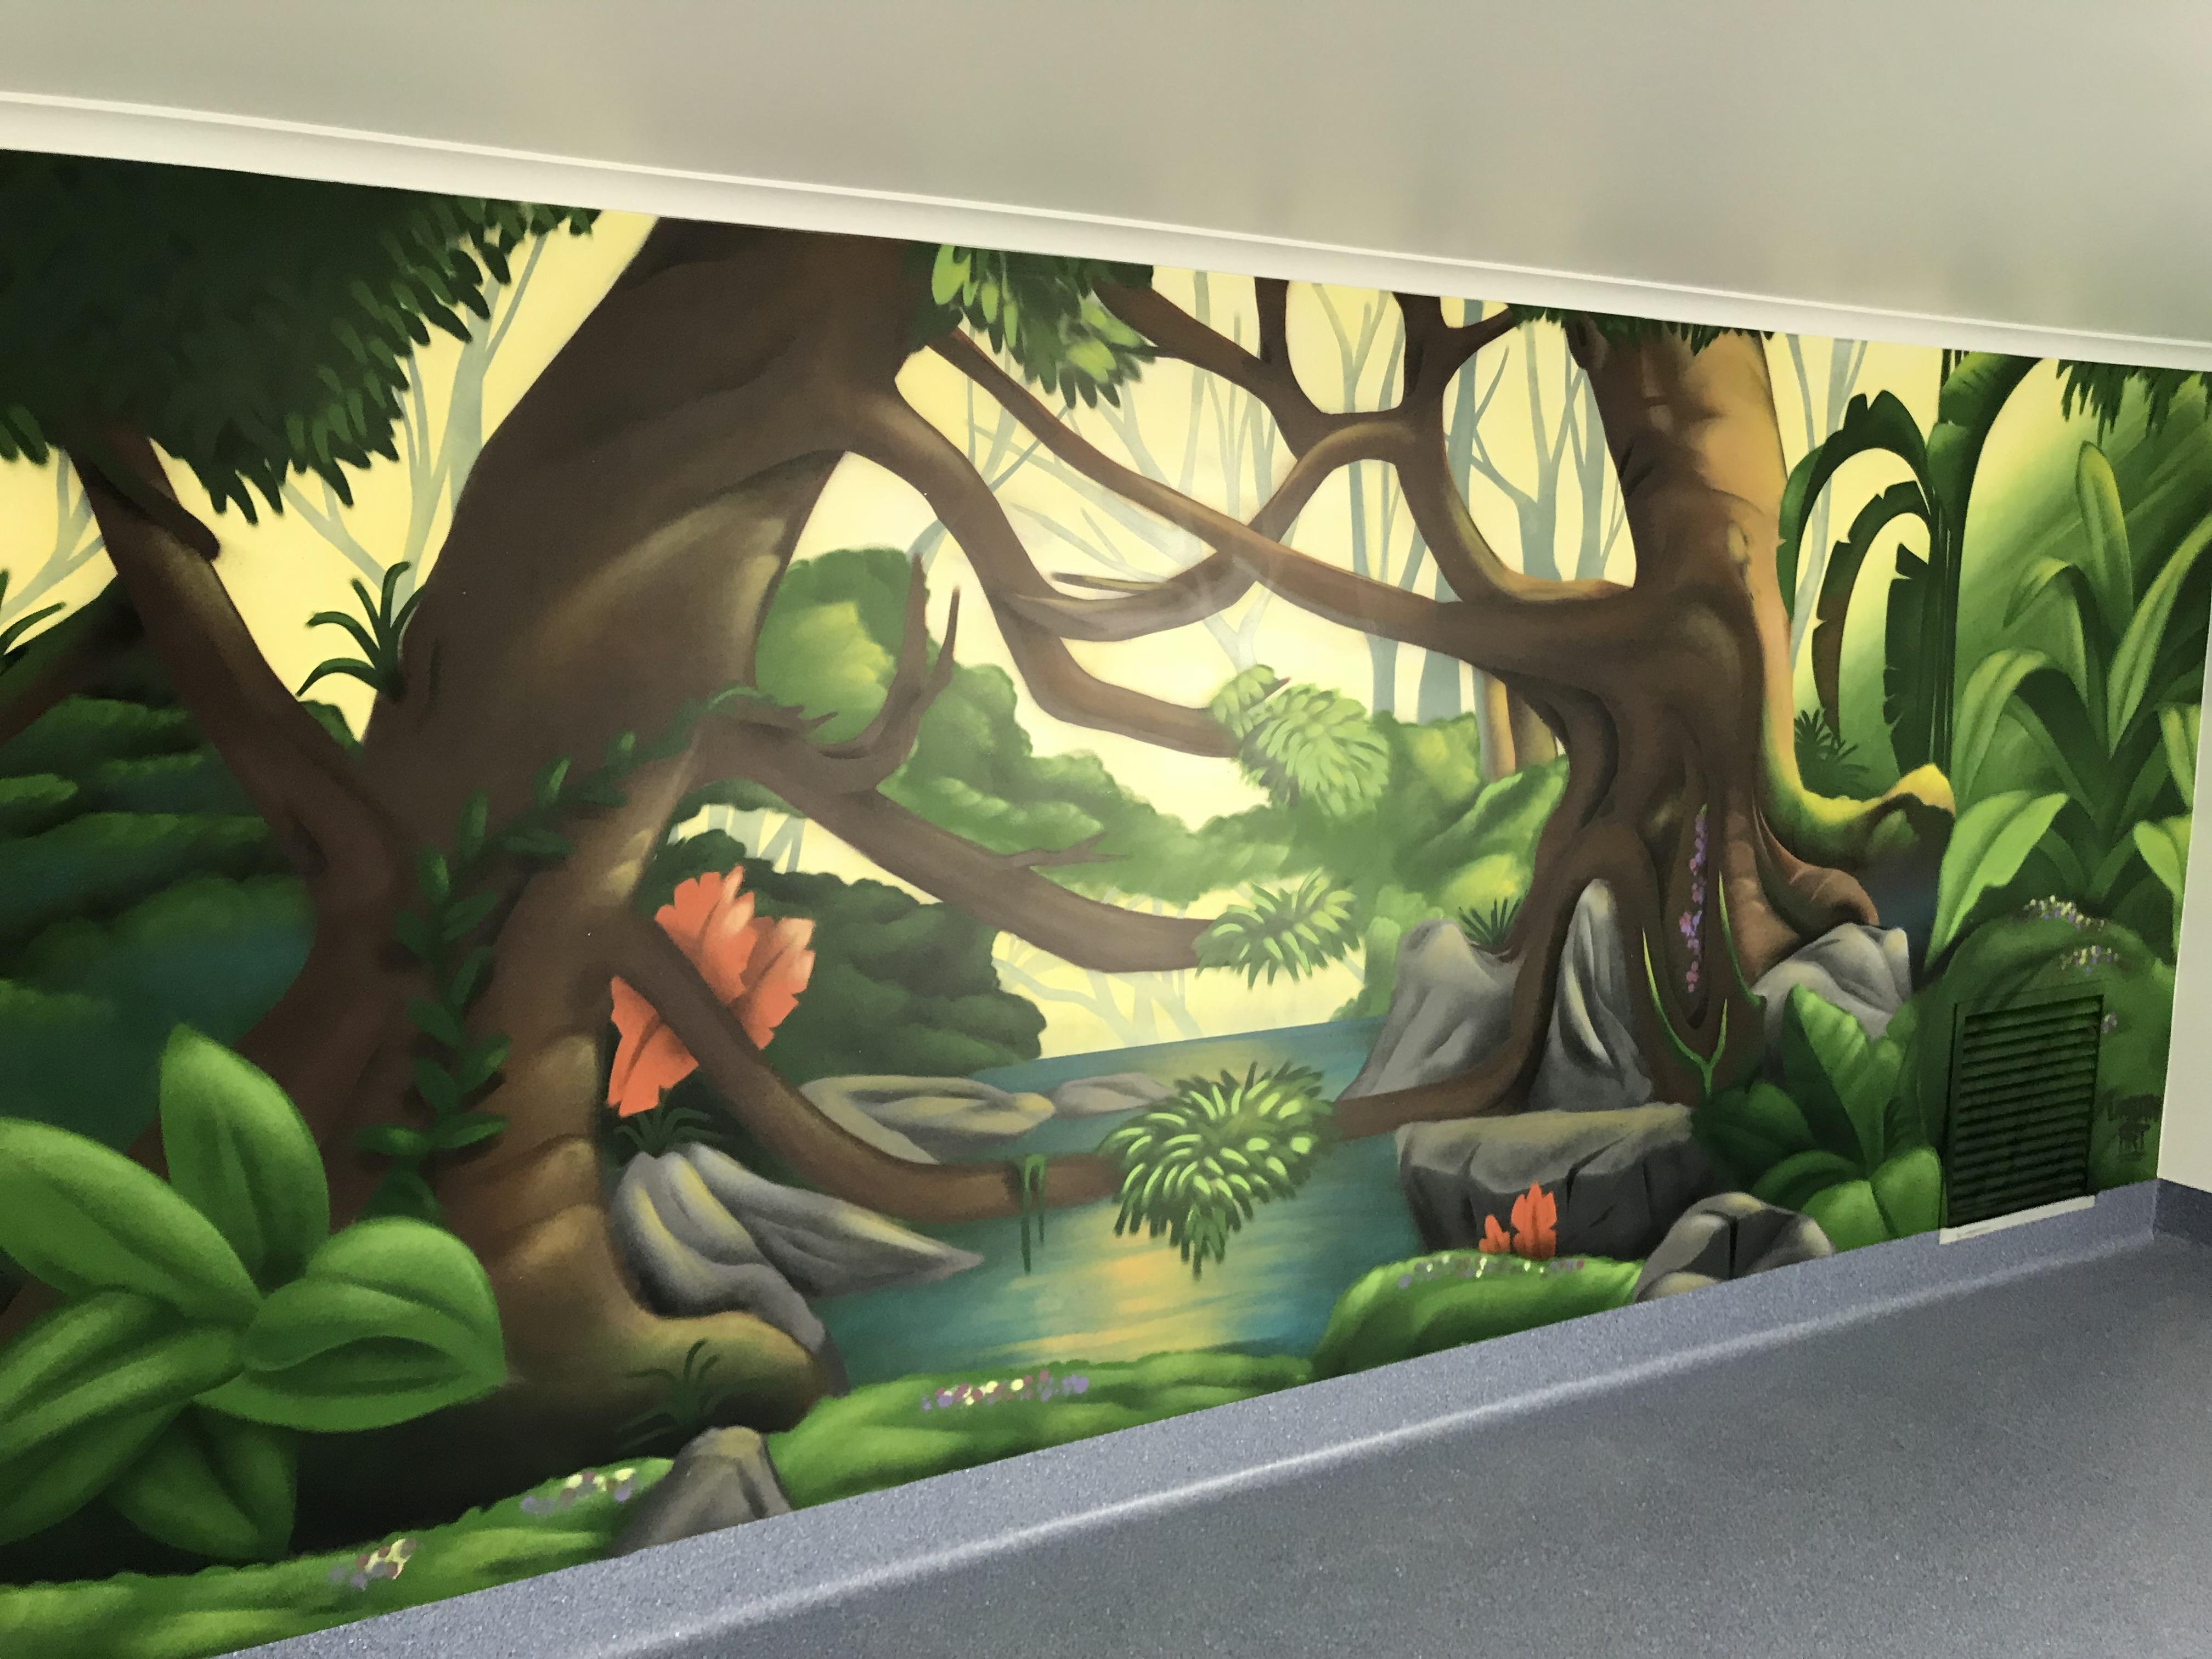 Pet play area mural wall art